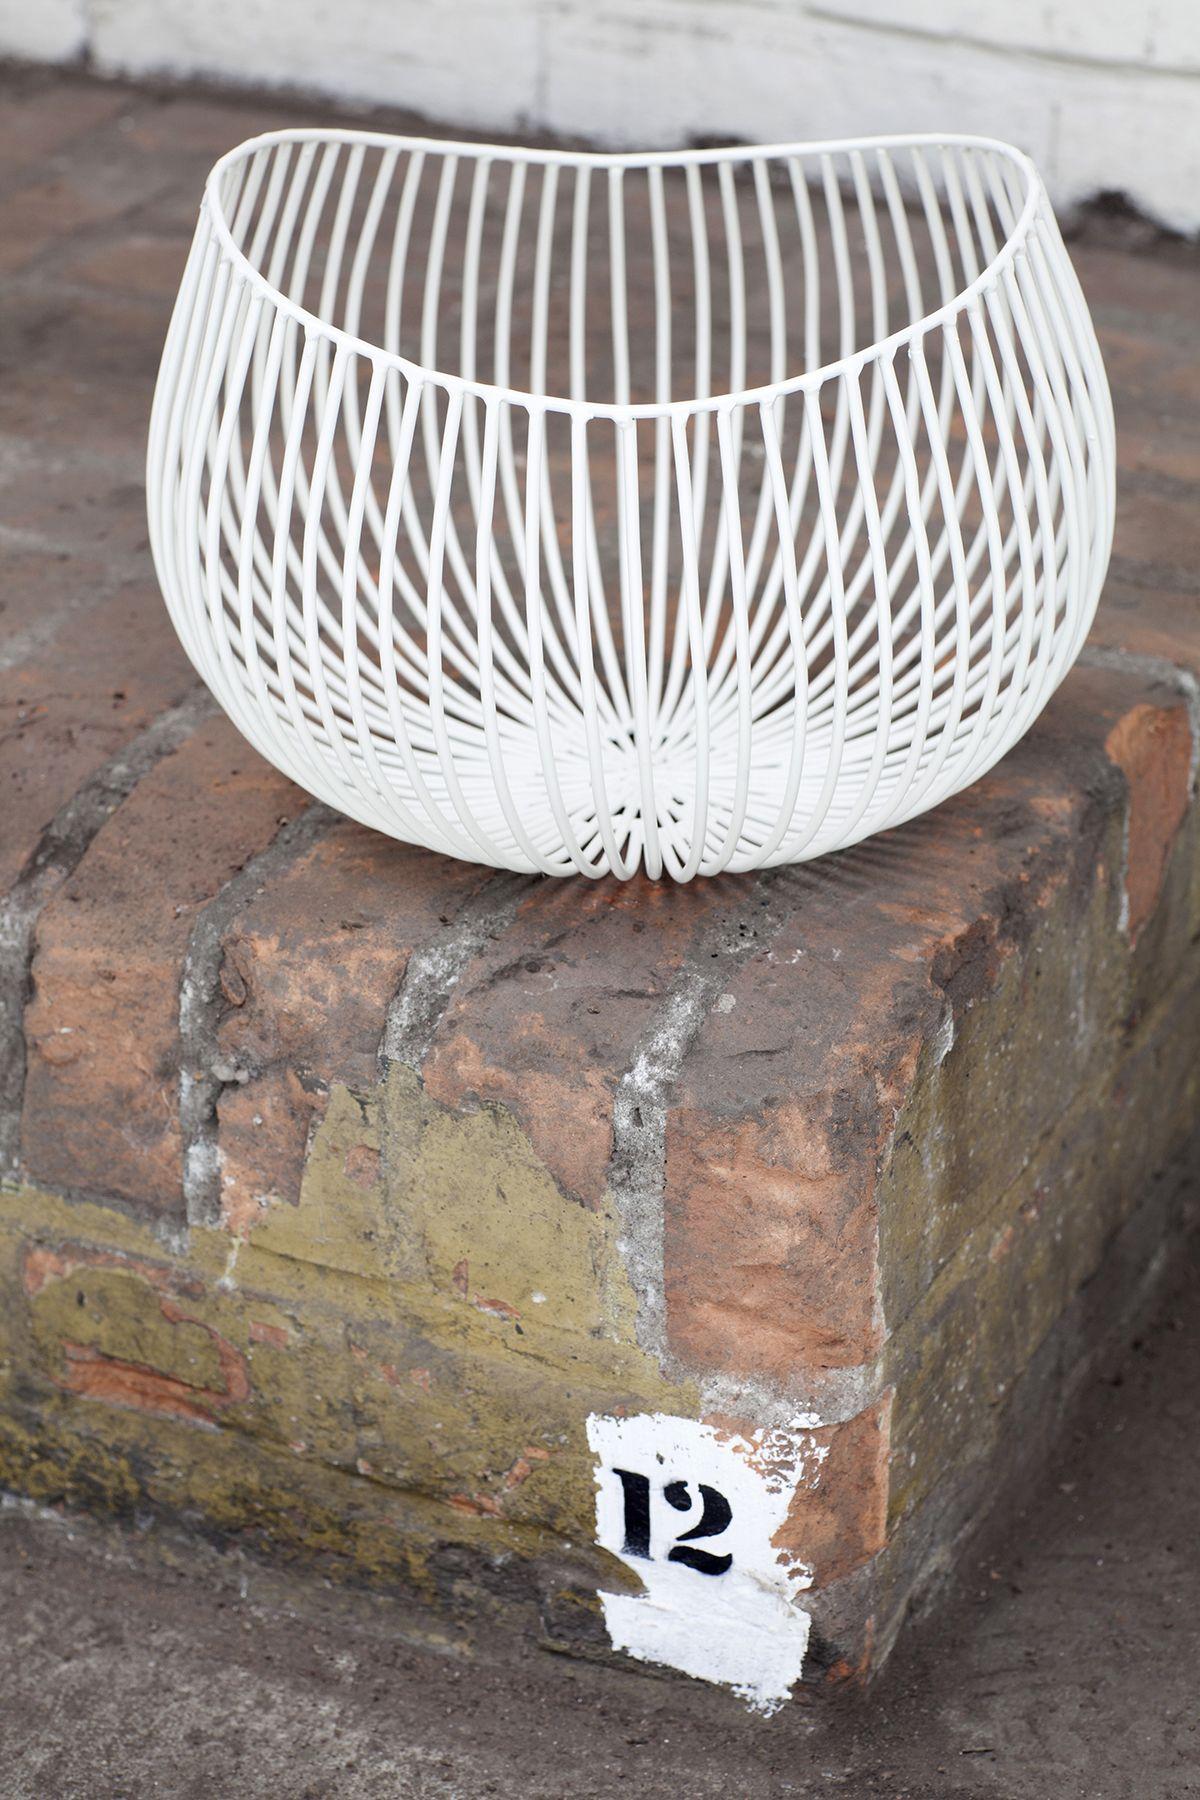 design by Antonino Sciortino for Serax